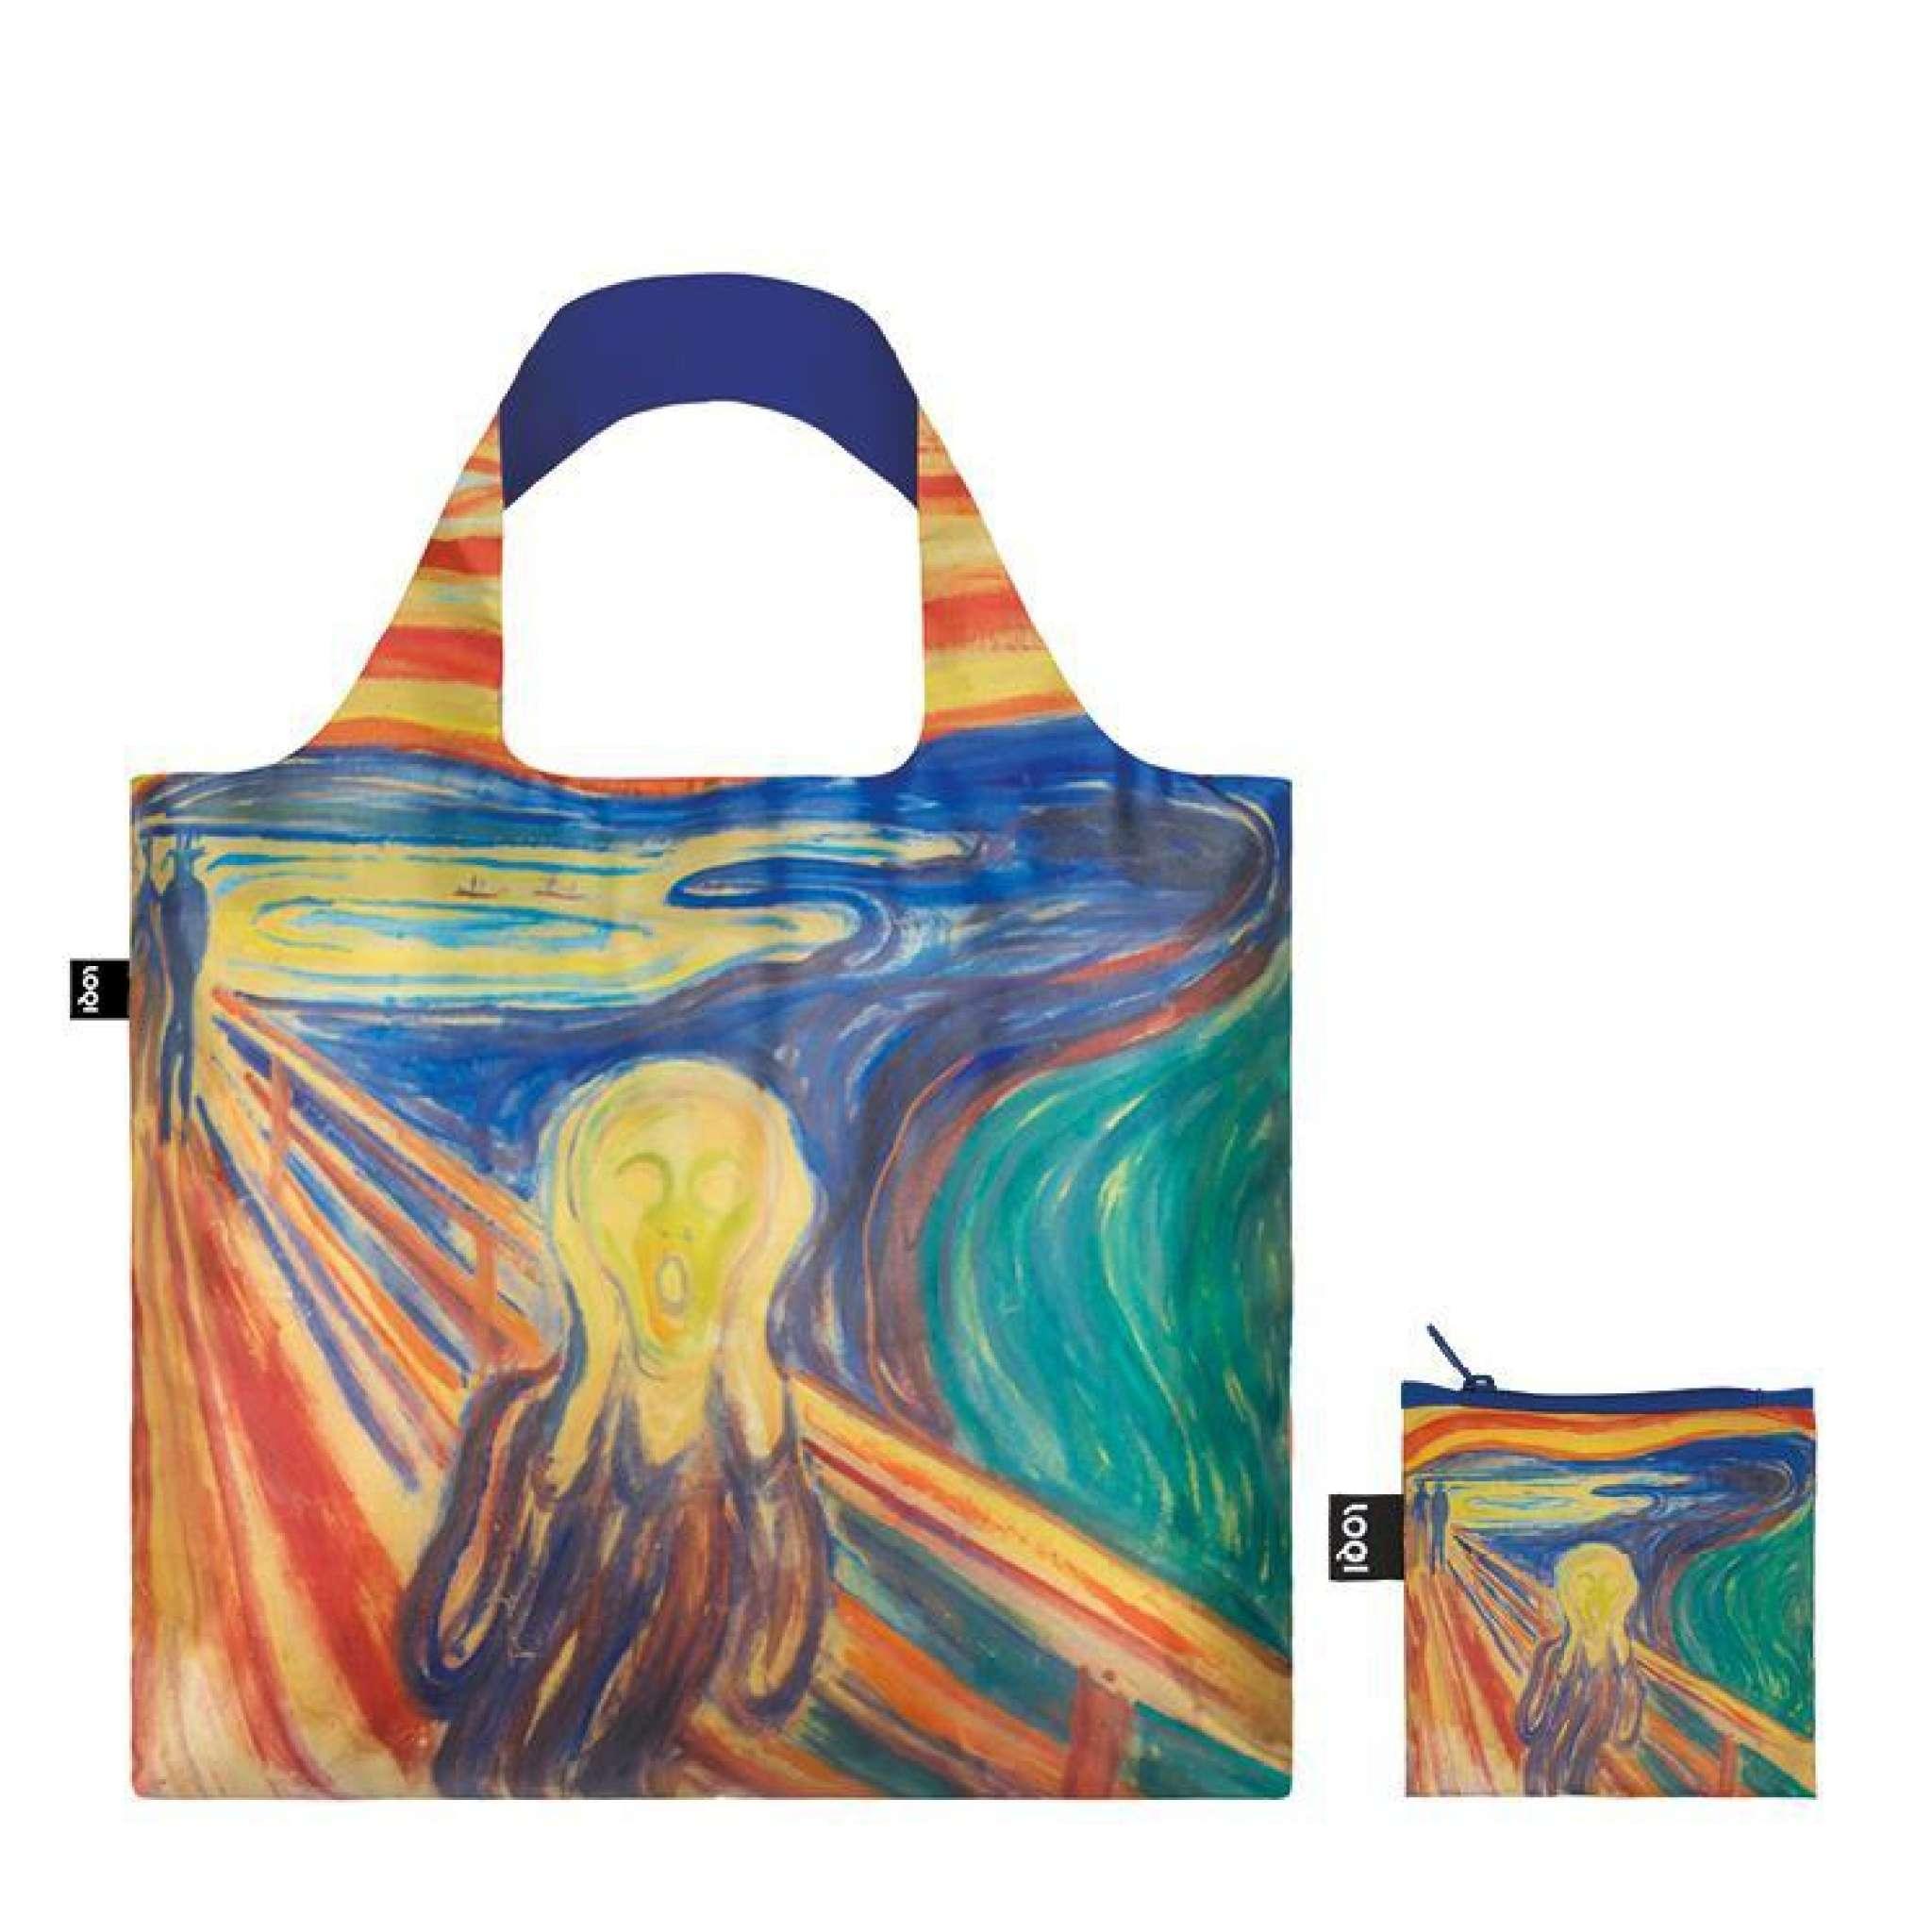 Shoppingbag, Edvard Munch Skriket